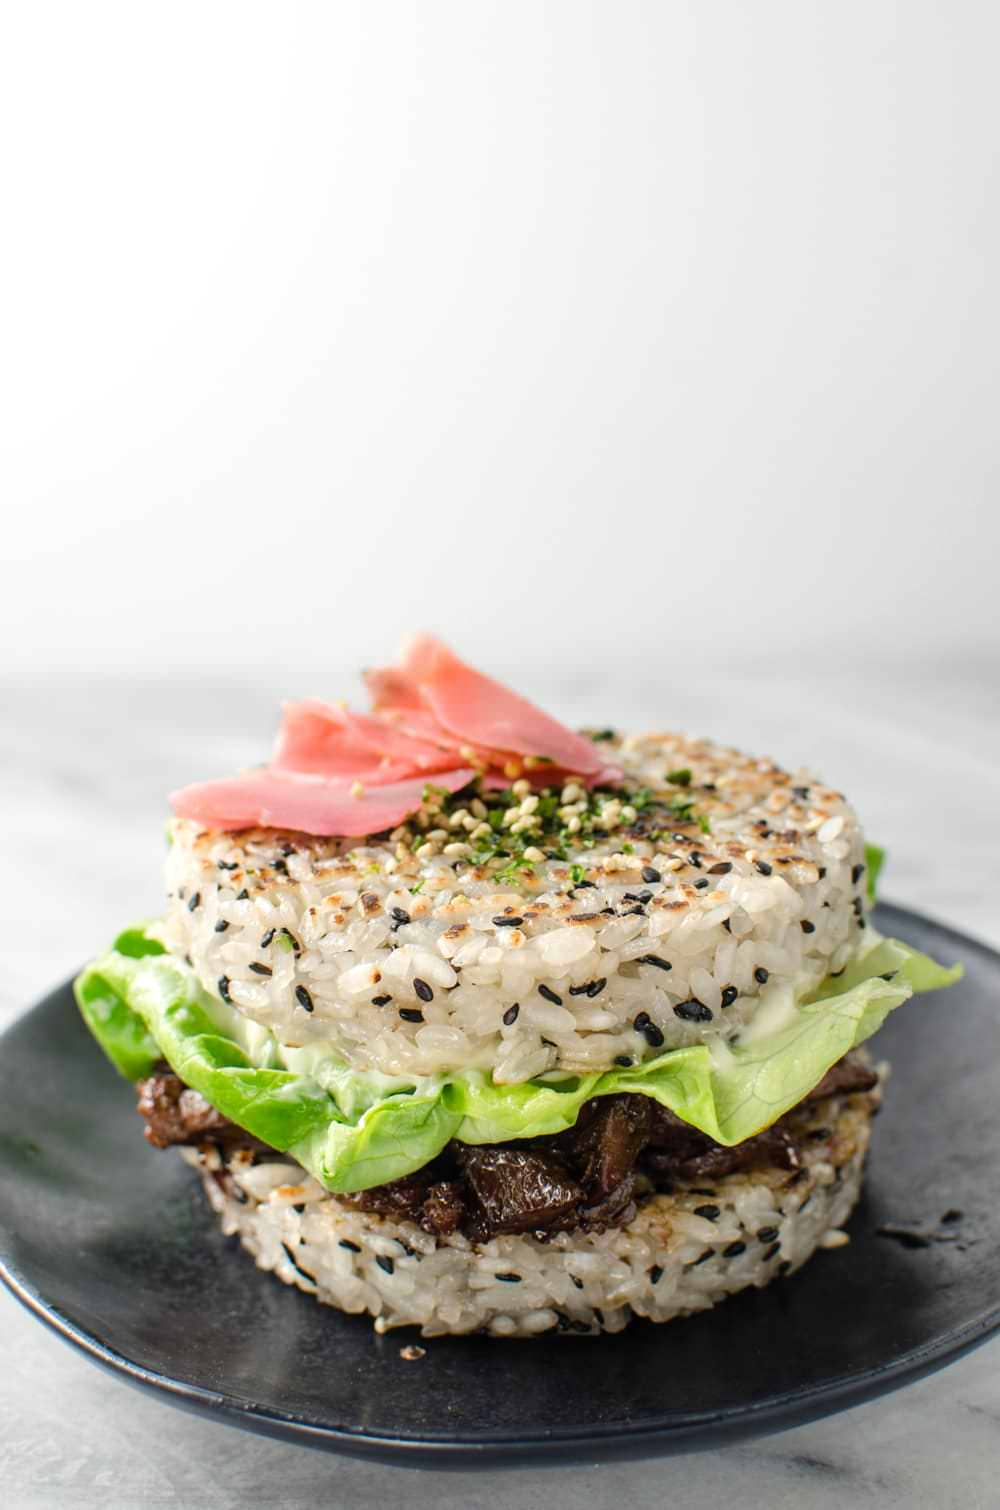 Teriyaki Steak Sushi Burger | The Flavor Bender